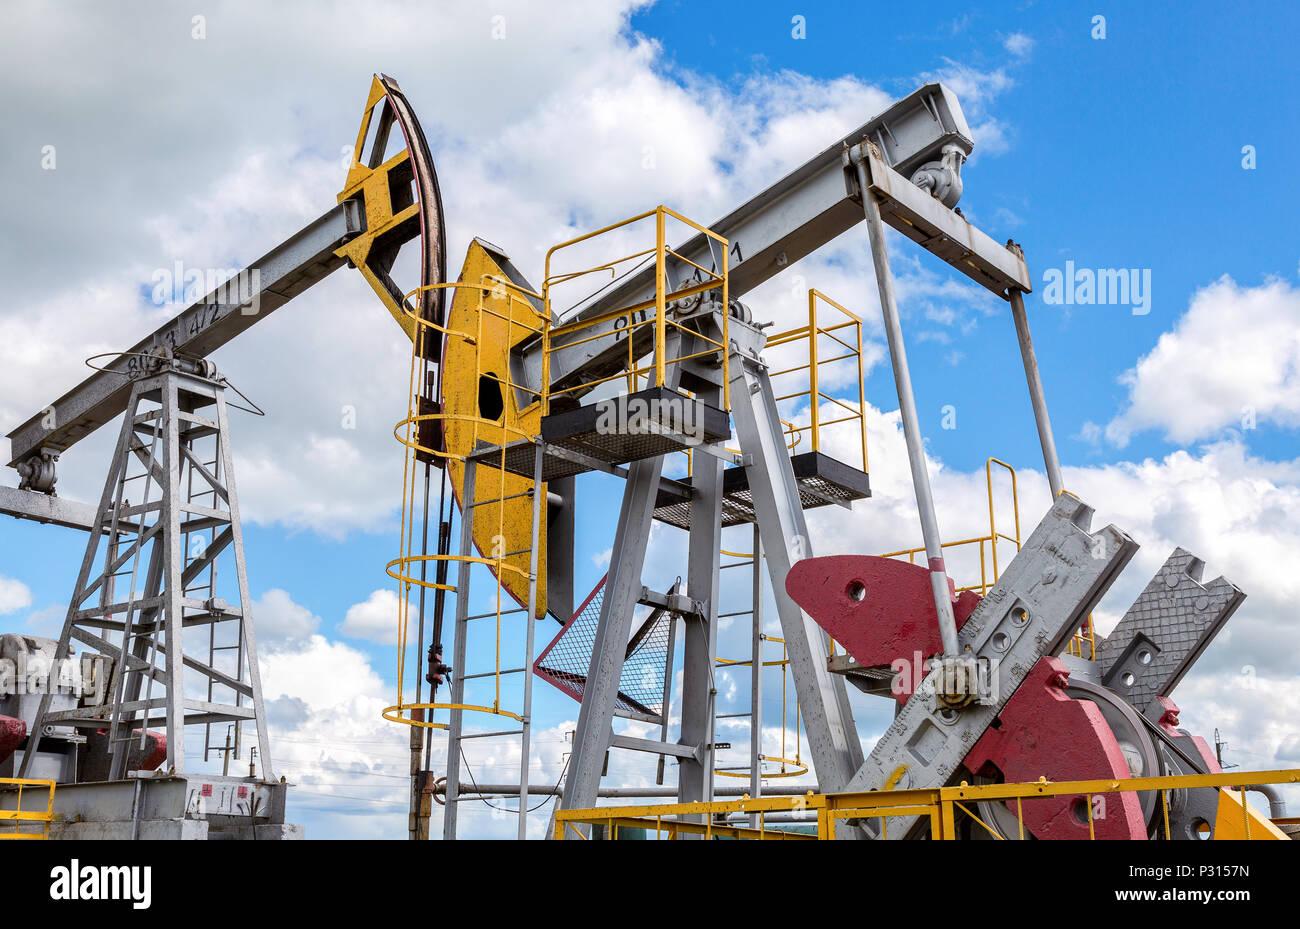 Tatarstan, Russia - June 10, 2018: Working pump jack fracking crude extraction machine. Oil industry equipment Stock Photo